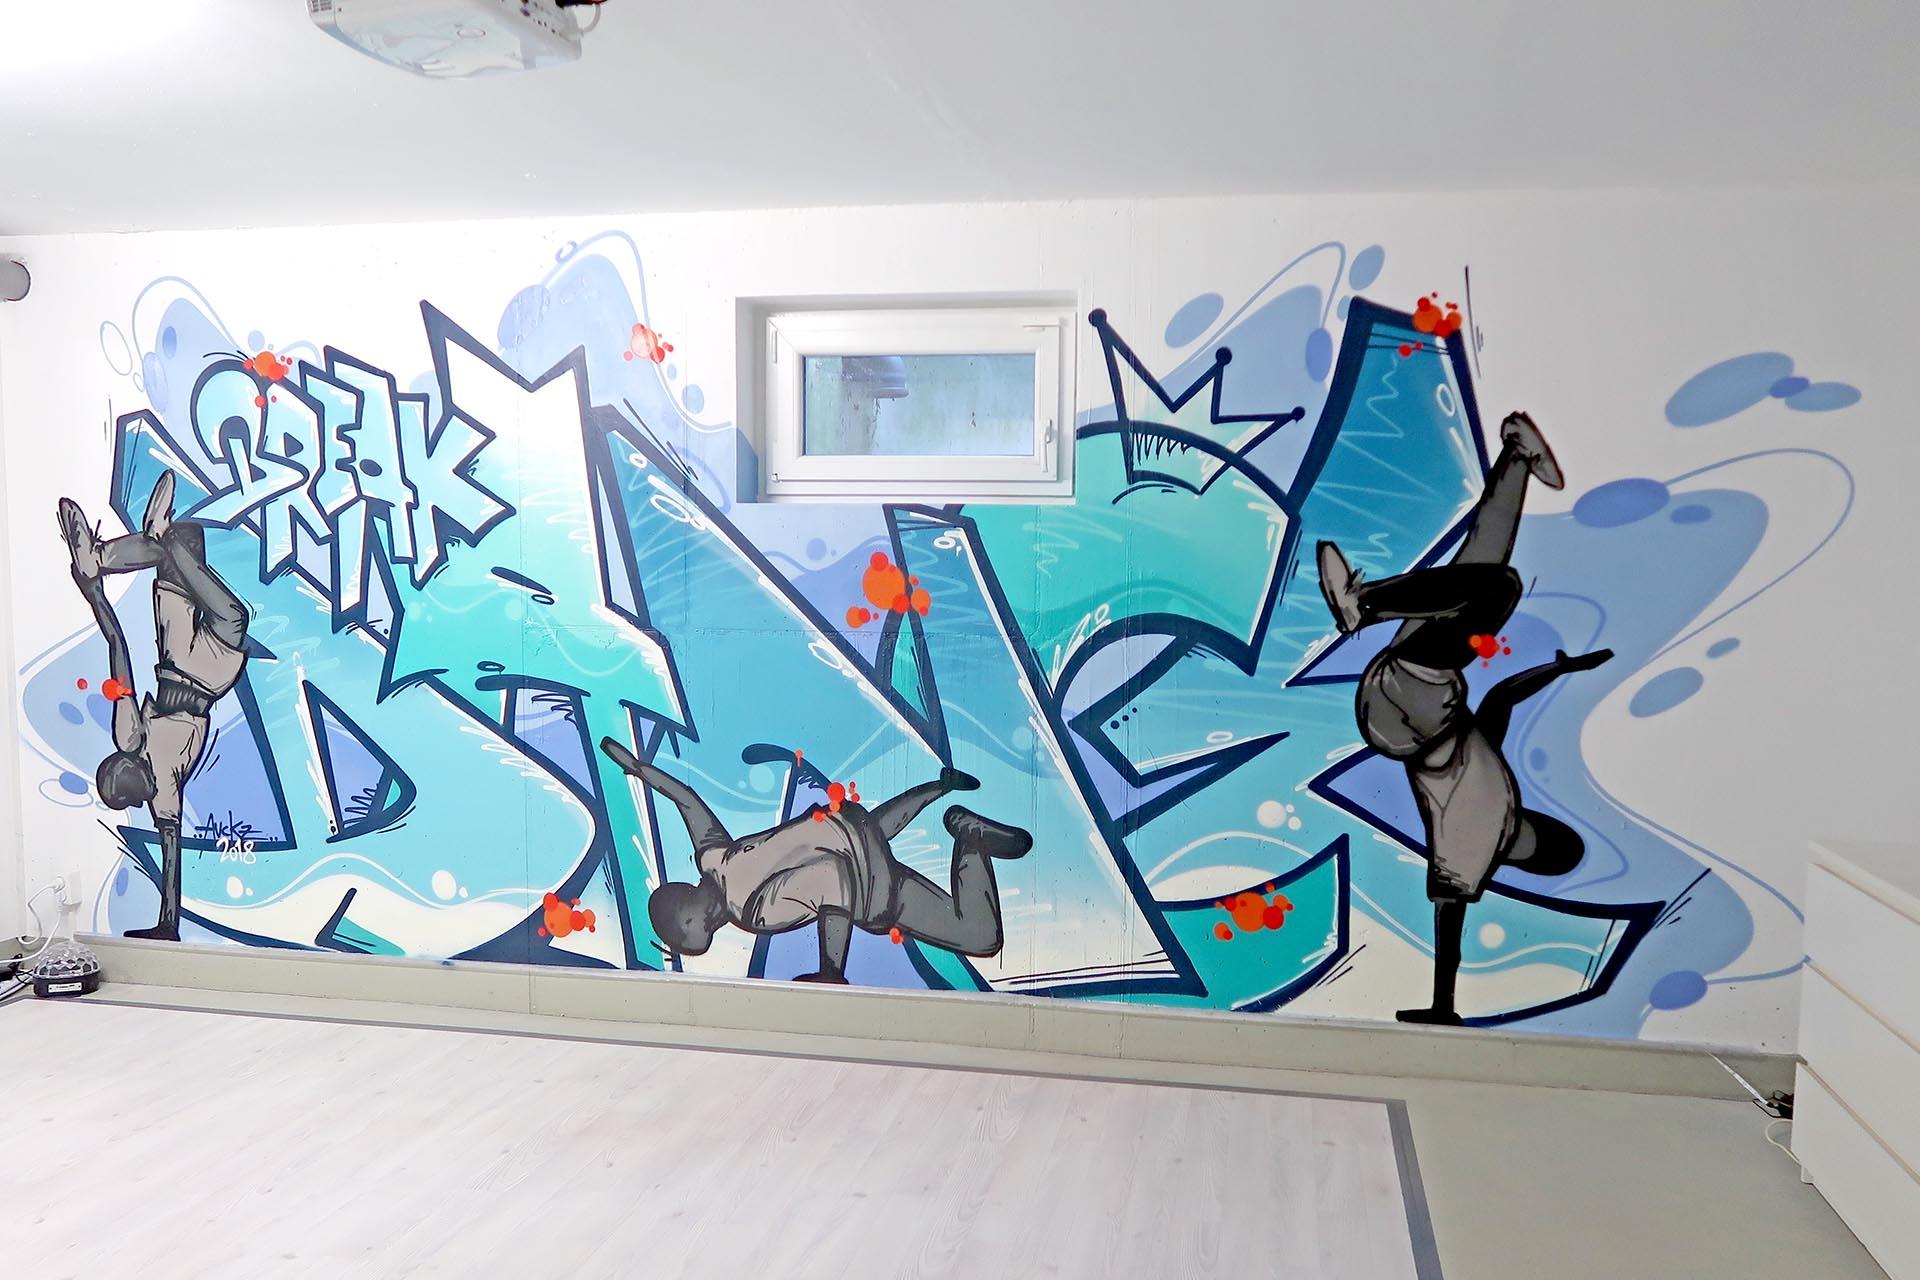 Graffiti Wand Auckz Break Dance